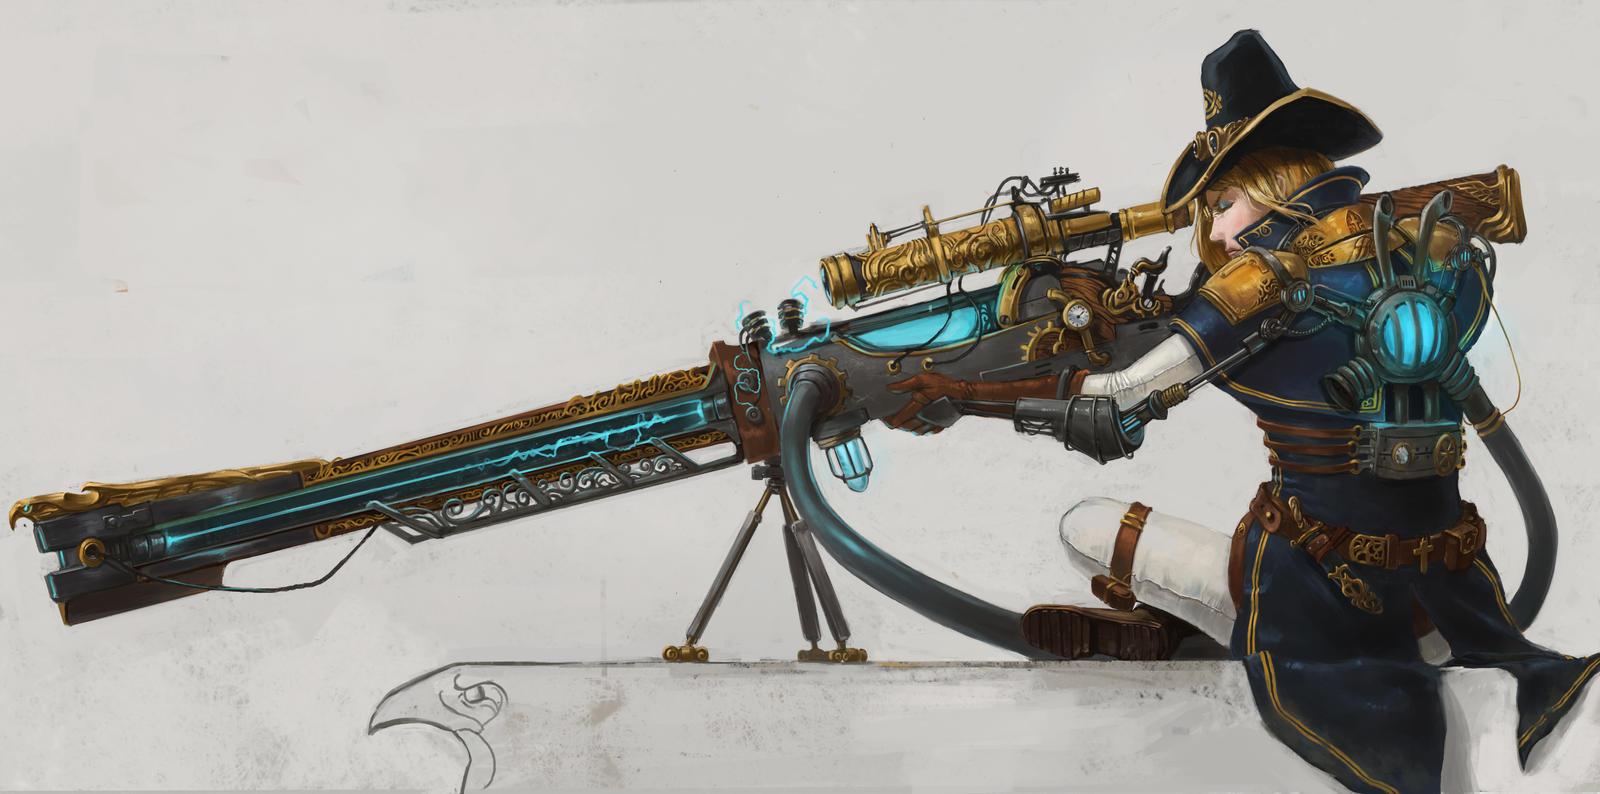 The Order 1886 contest entry: Rail gun